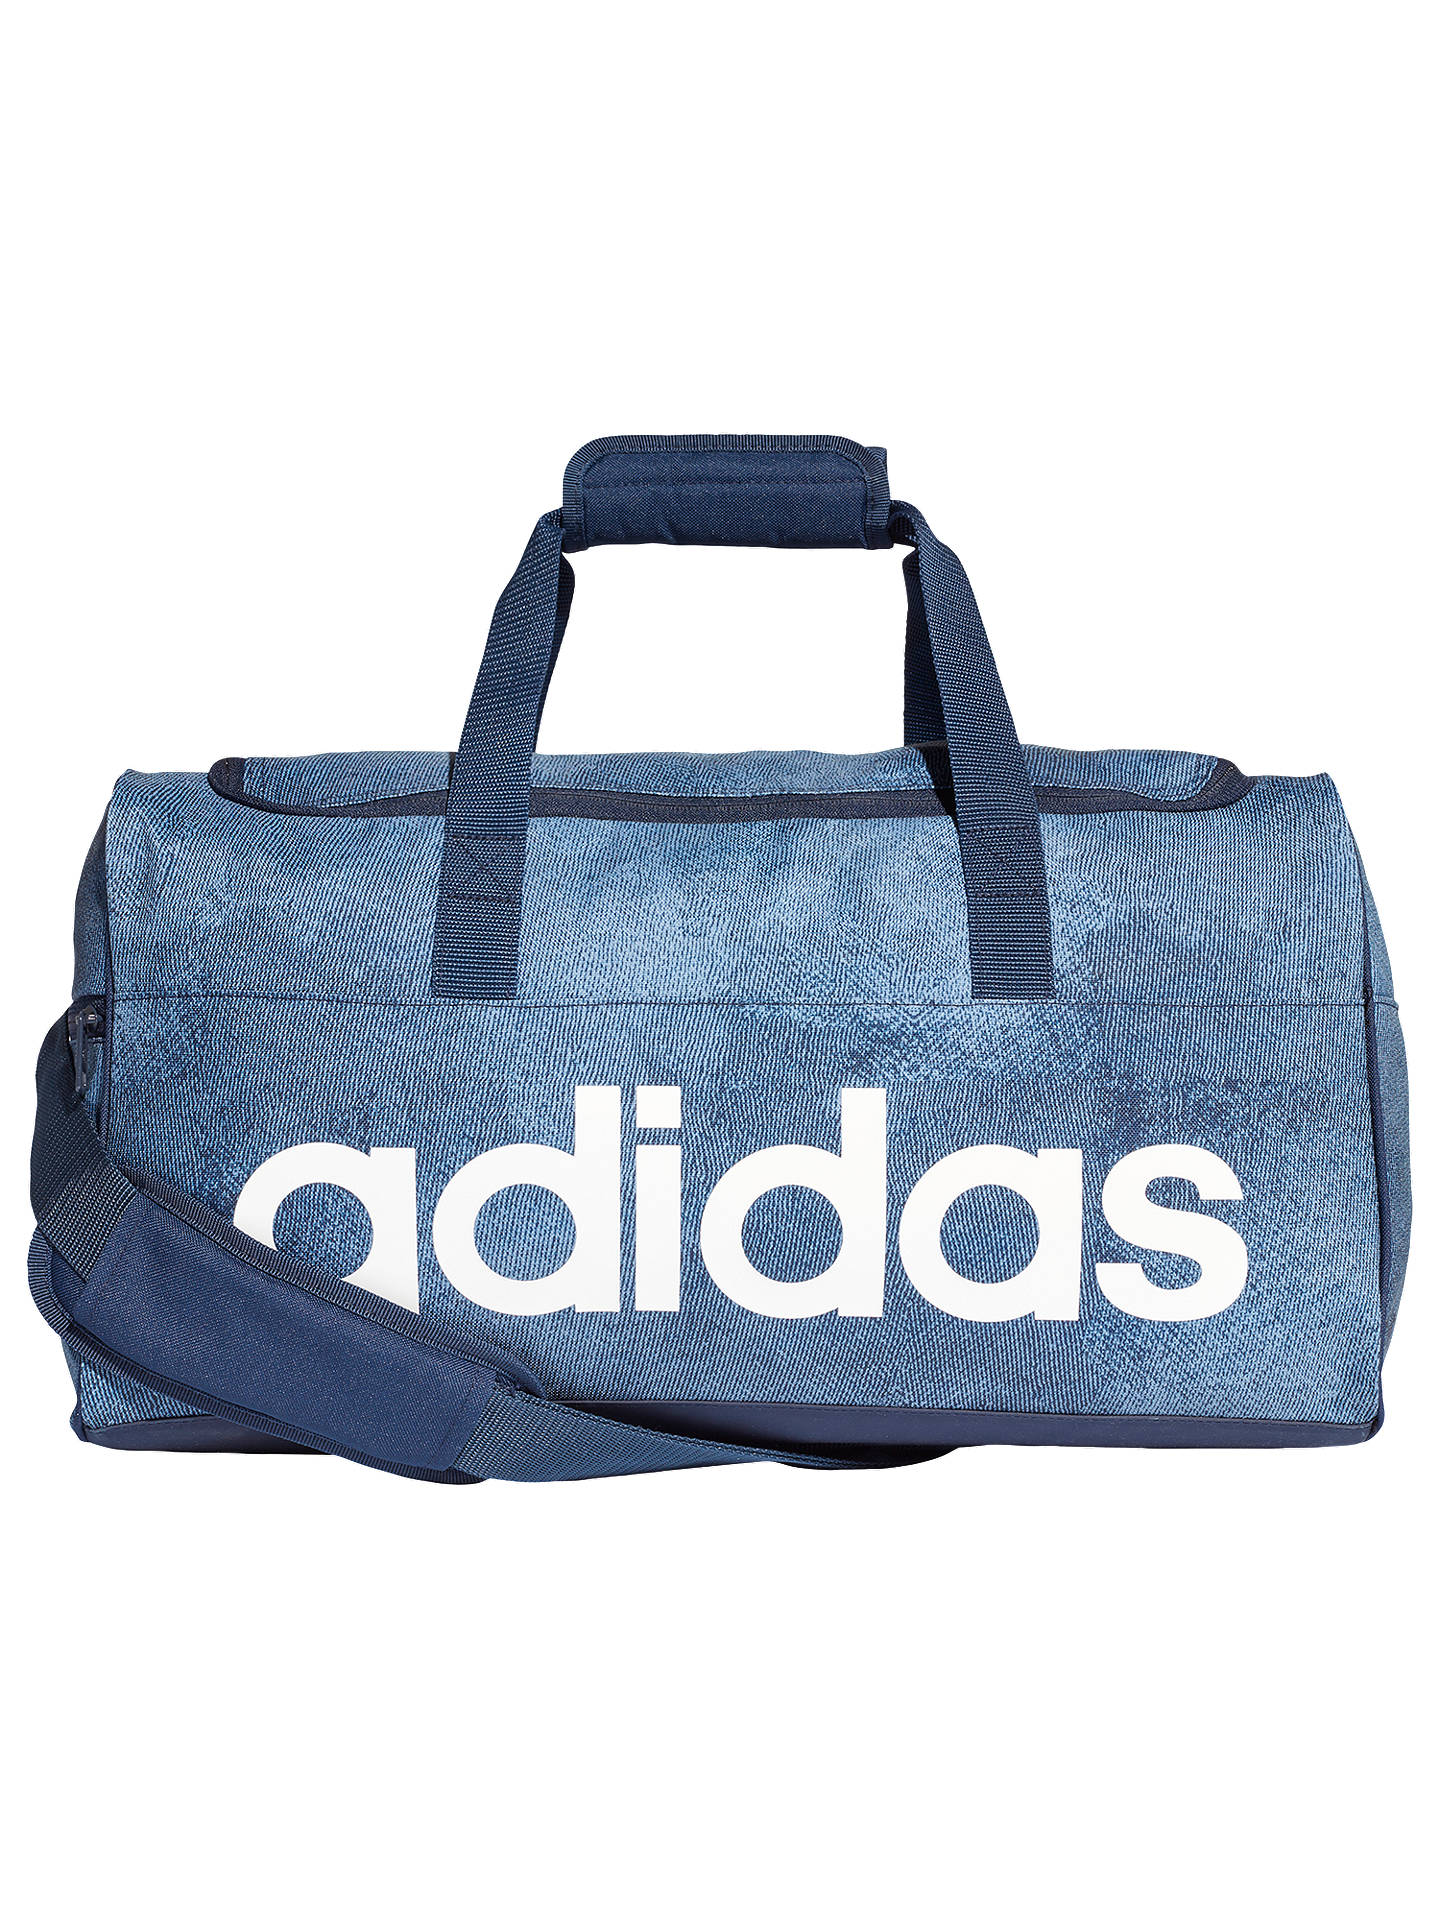 3059d2682c51b0 Buy adidas Linear Performance Duffel Bag, Small, Raw Steel Online at  johnlewis.com ...